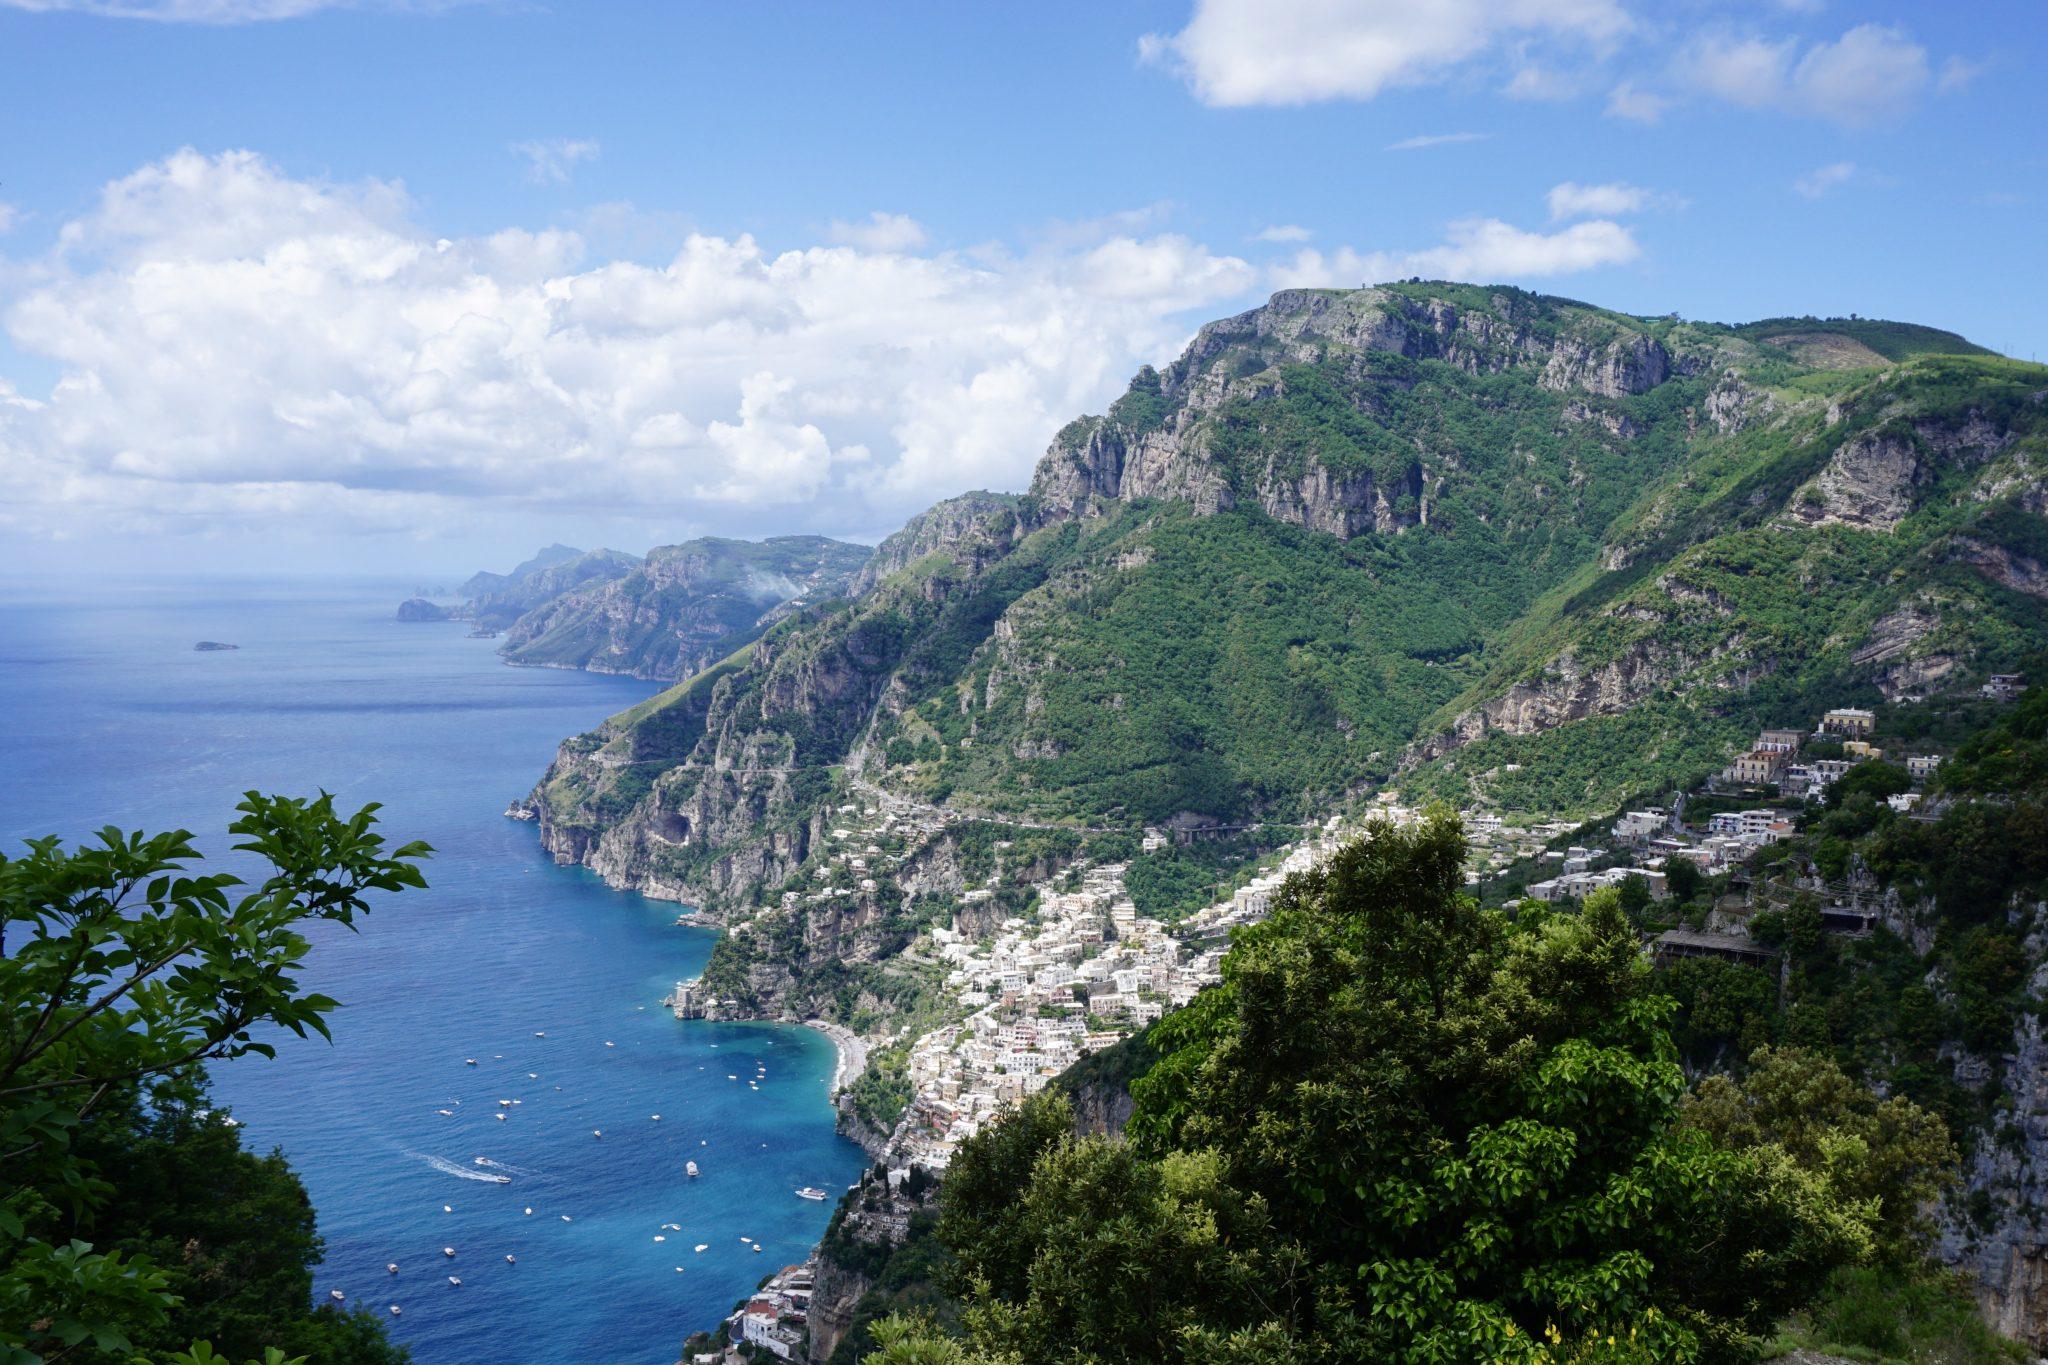 amalfi coast views, path of the gods, positano, Italy